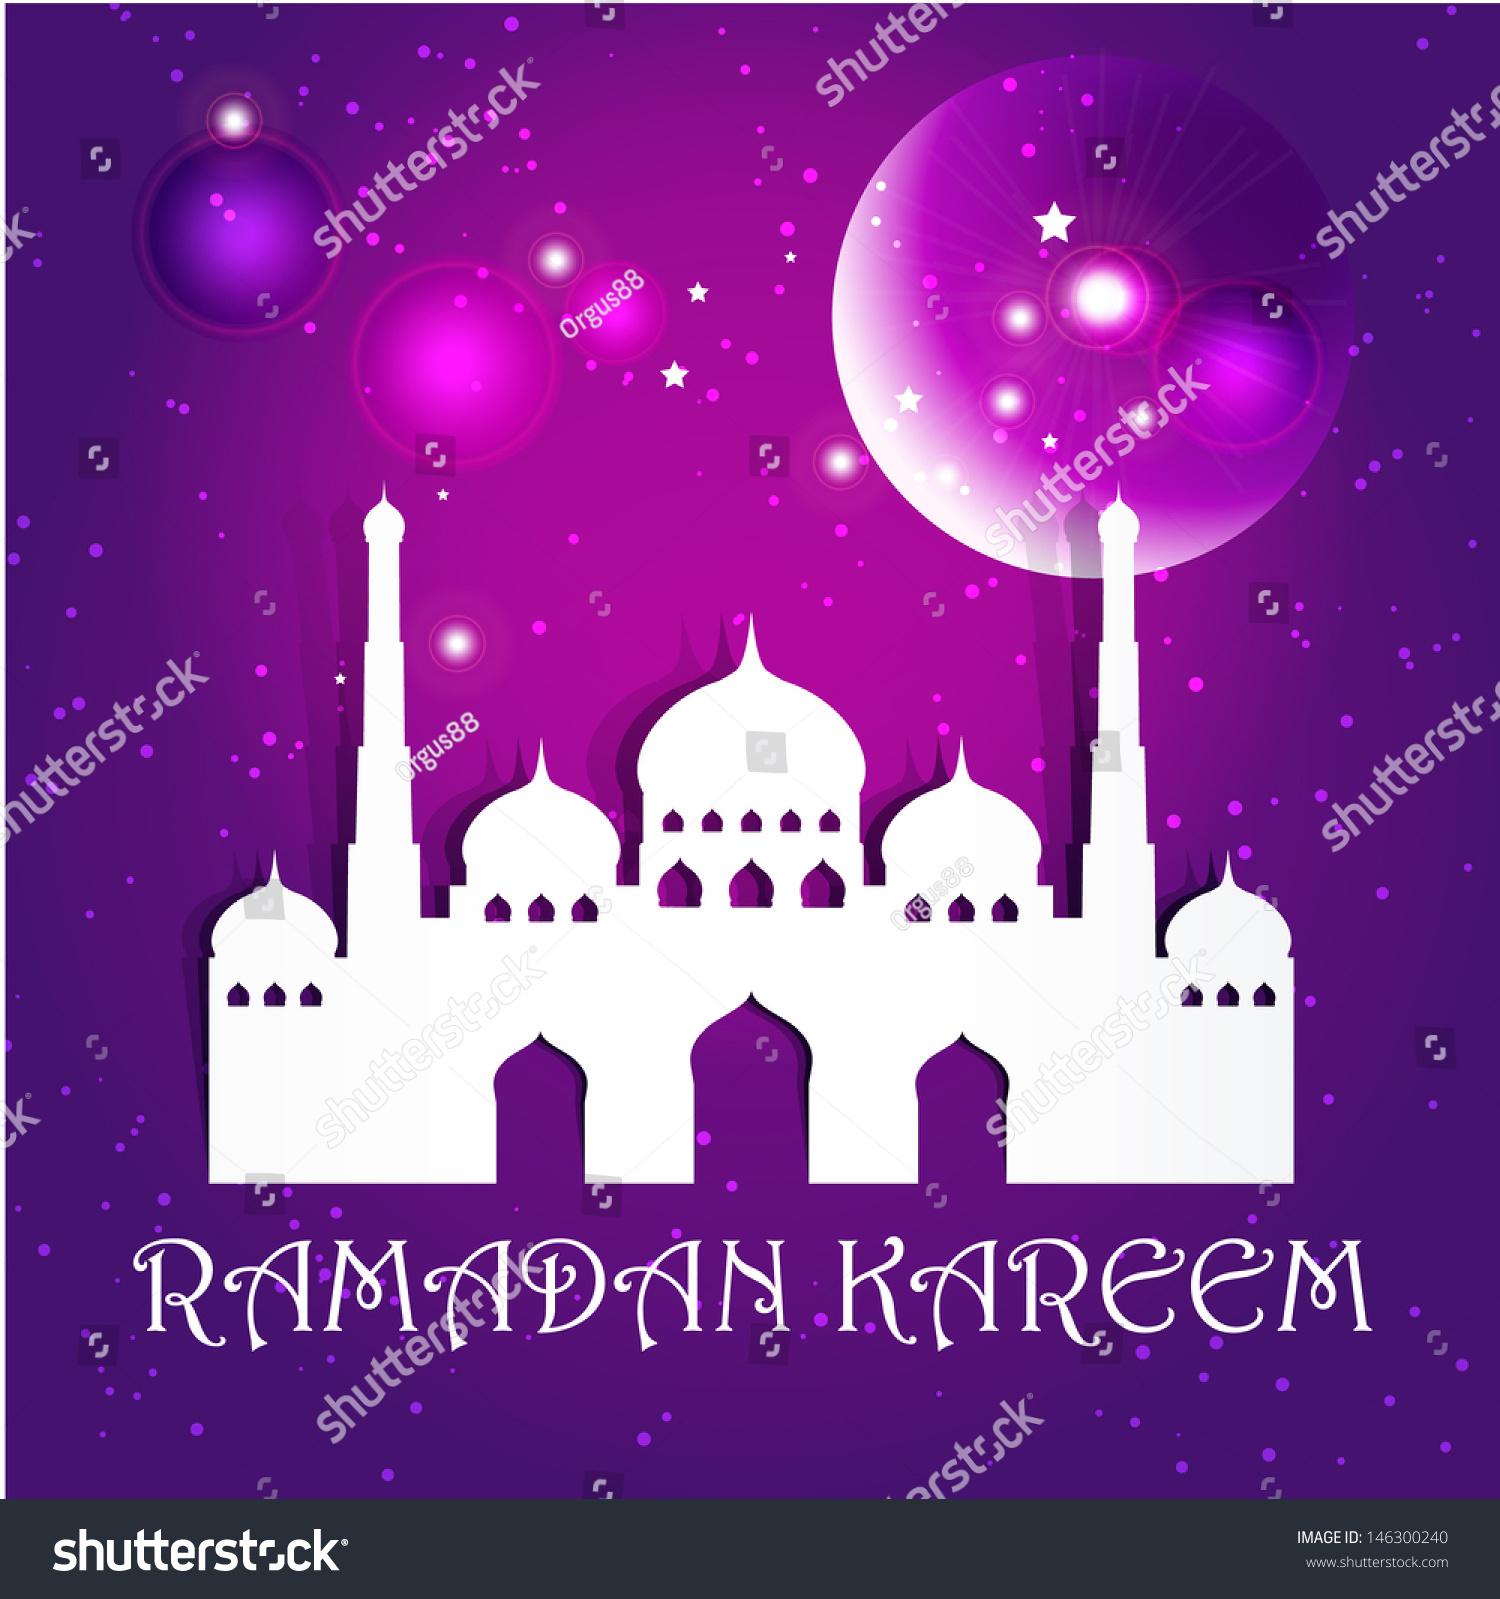 Ramazan kareem greeting card mosque crescent stock vector 146300240 ramazan kareem greeting card mosque and crescent moon with stars ramazan kareem on night islamic kristyandbryce Image collections